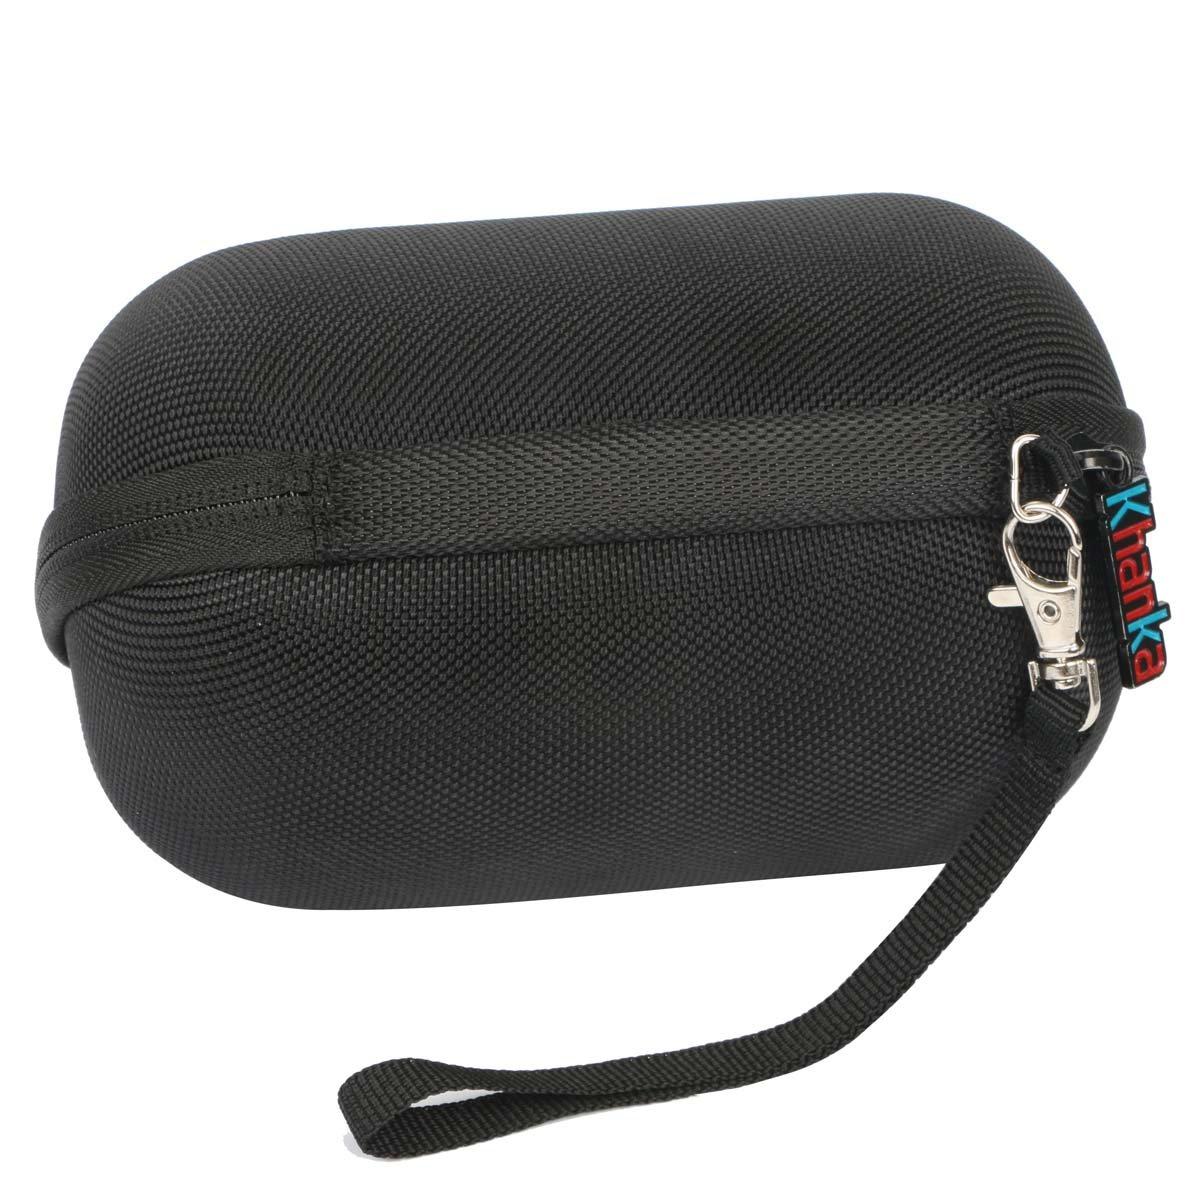 Khanka Hard Travel Case for Ultimate Ears WONDERBOOM Waterproof Super Portable Bluetooth Speaker - (Black)